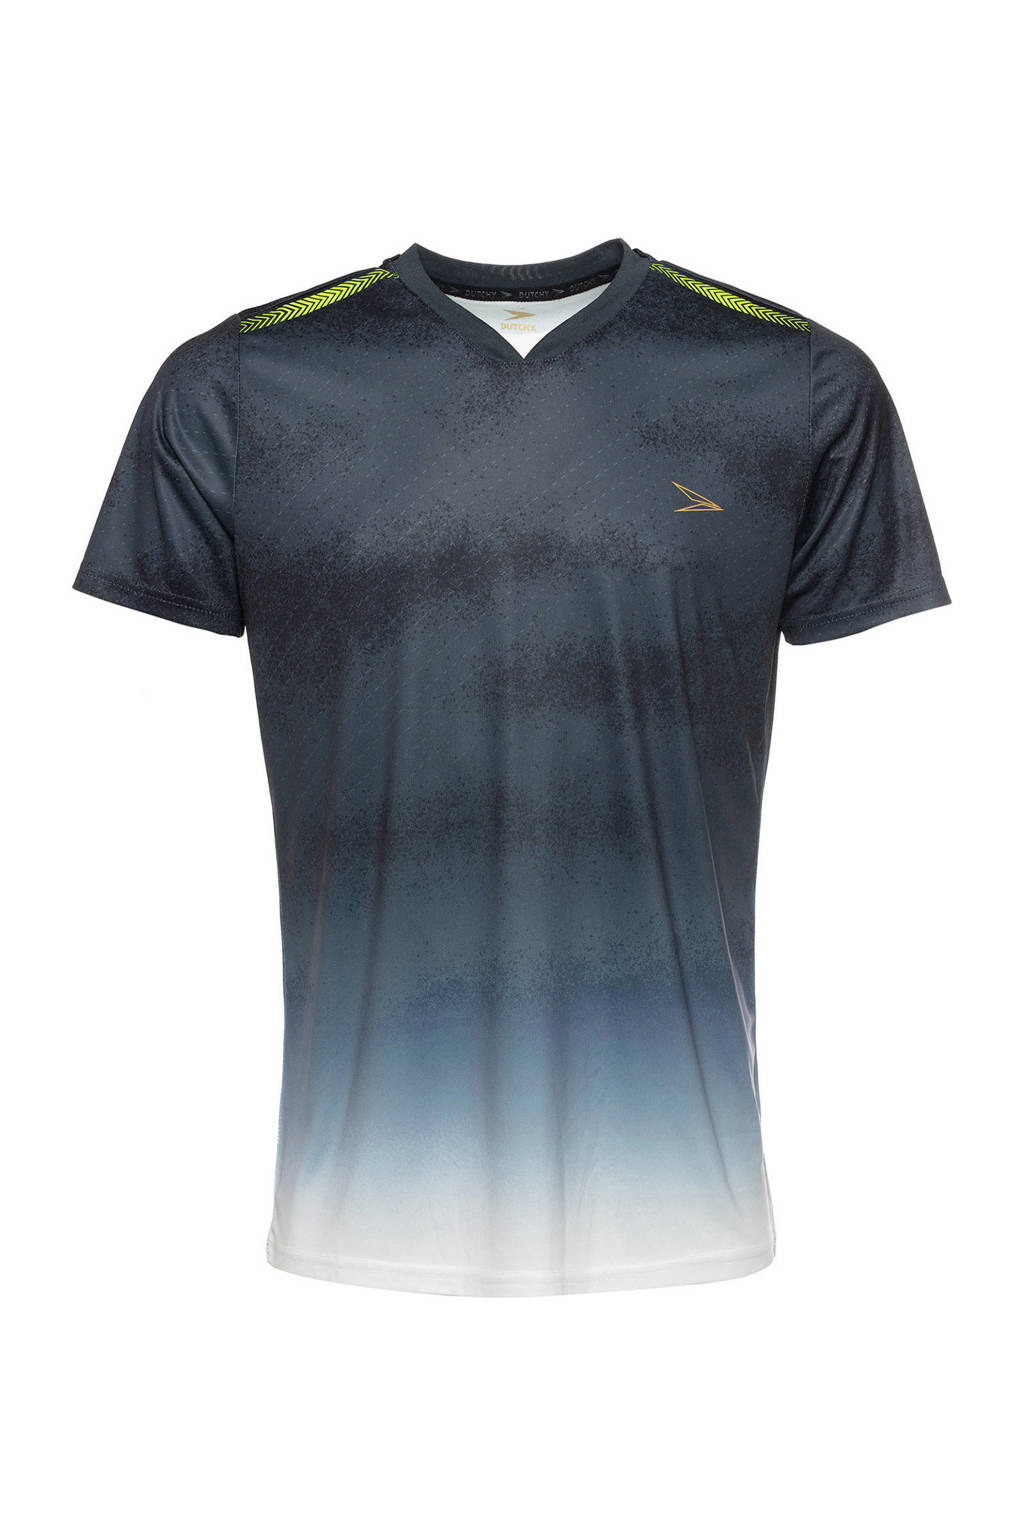 Scapino Dutchy Senior  voetbalshirt zwart/wit, Zwart/wit